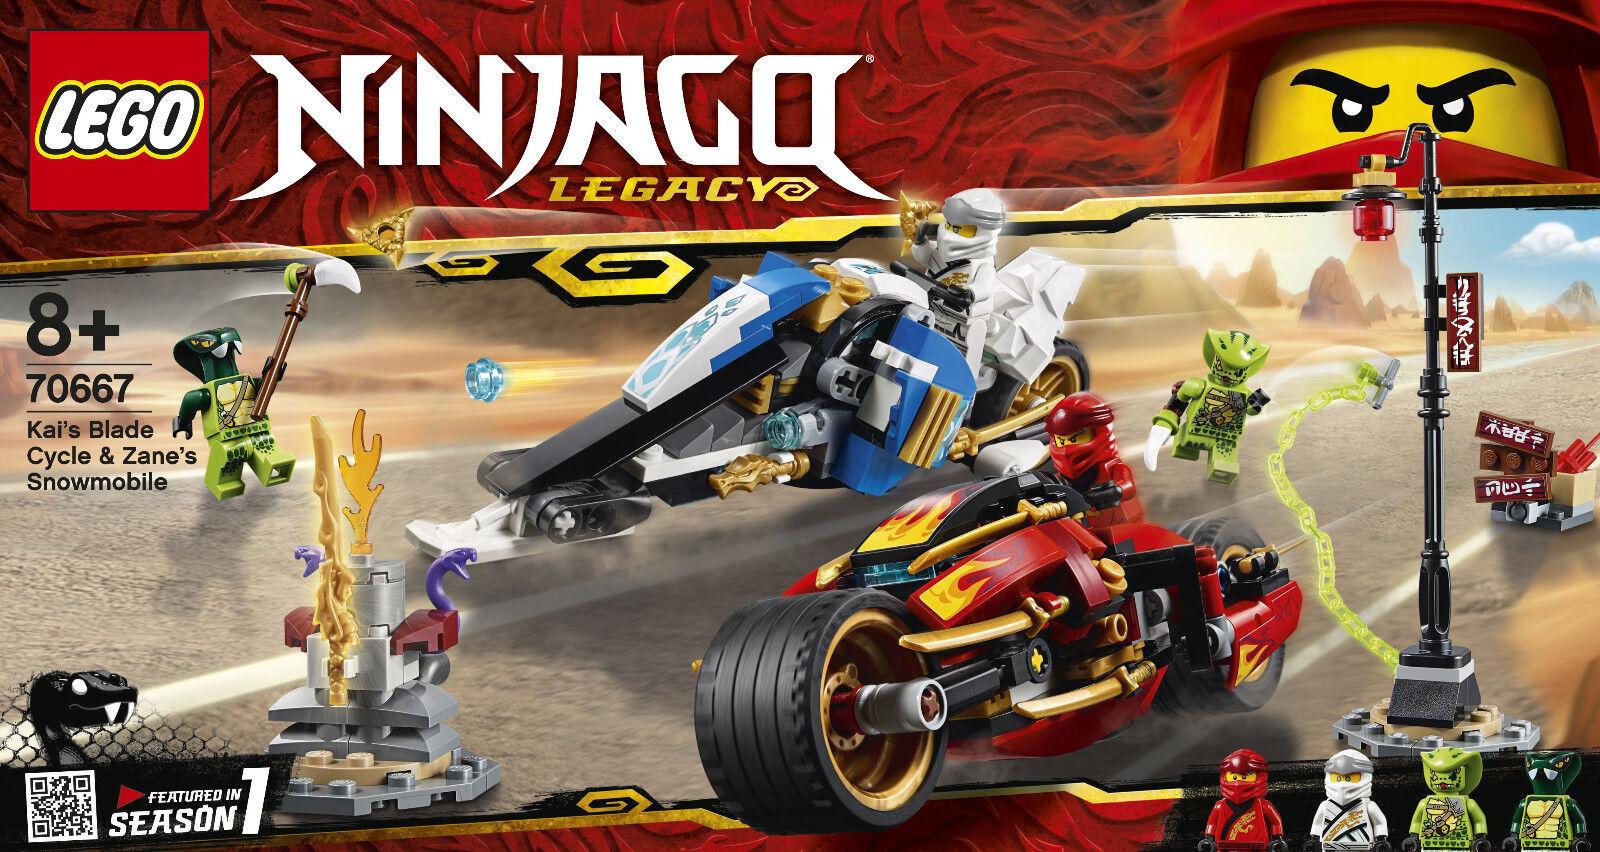 Lego Ninjago 70667 - Quay Feuer-Bike & Zanes Snowmobile, Nip